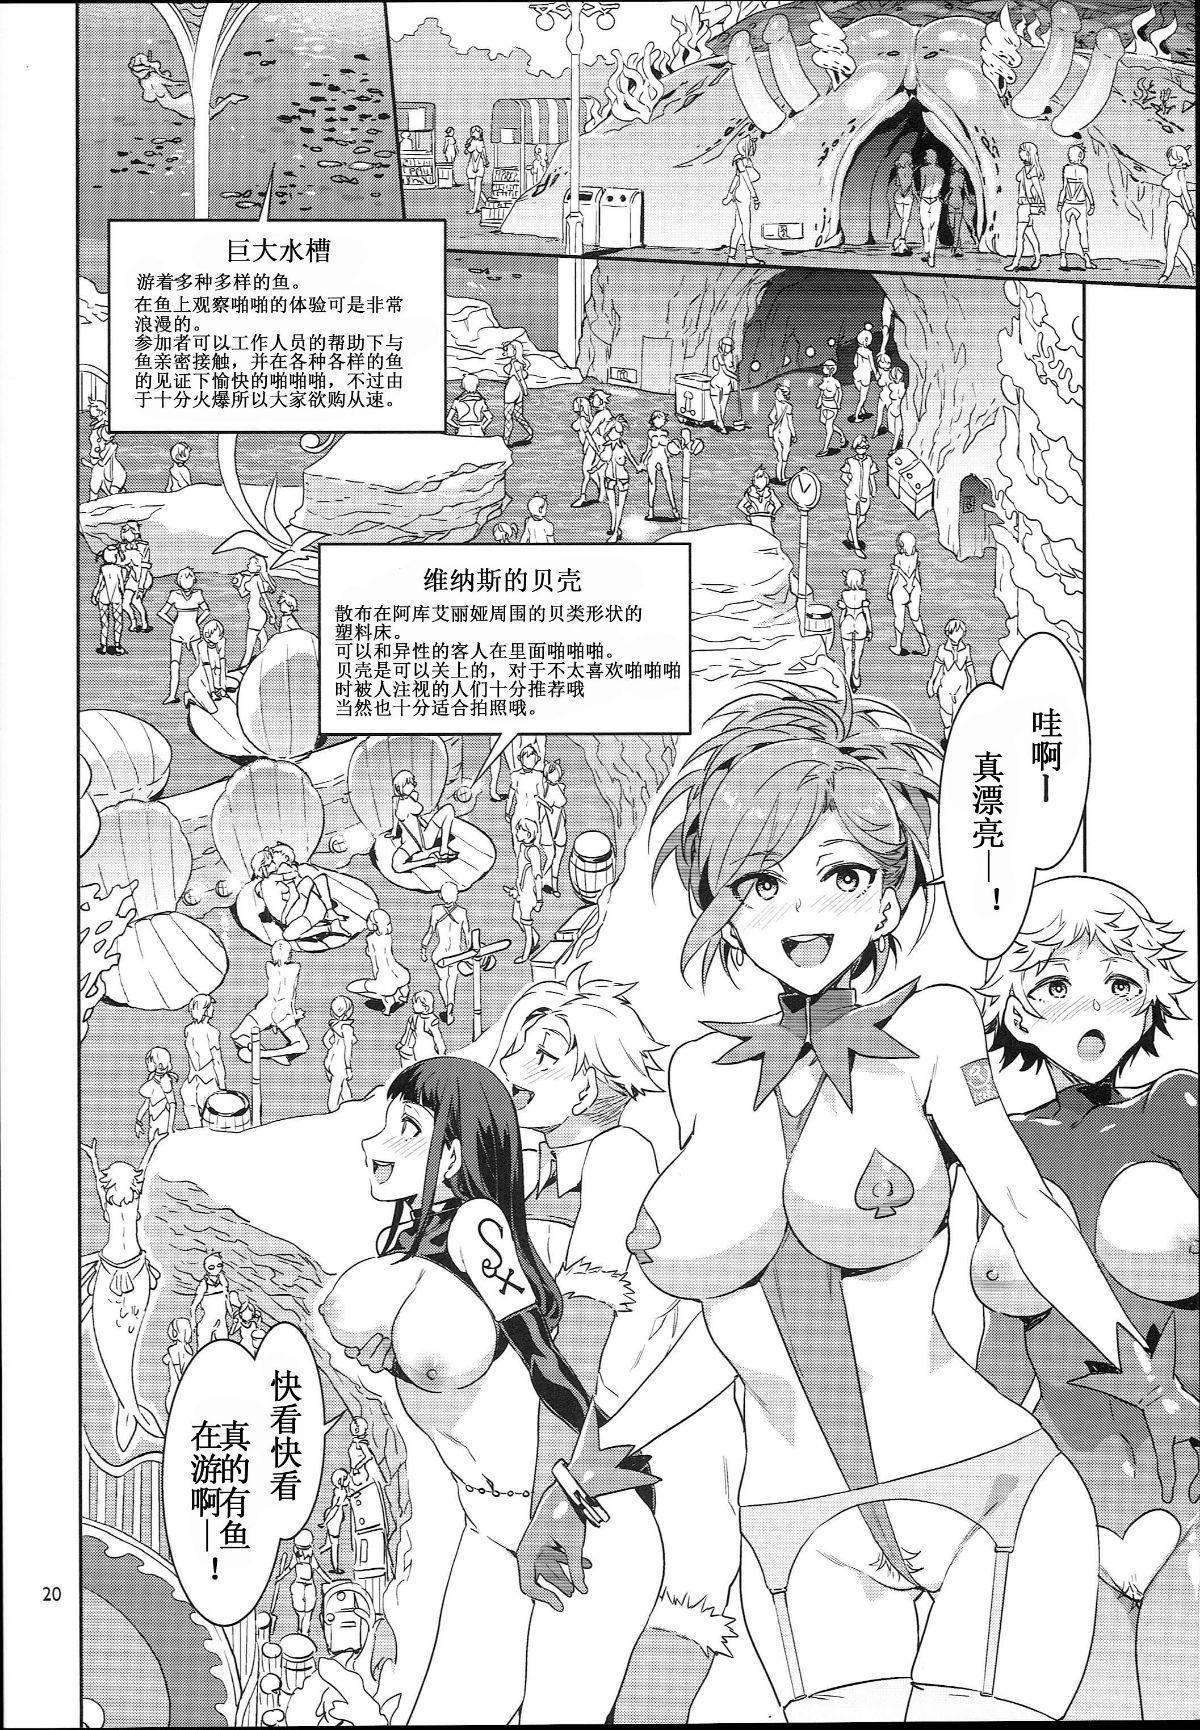 Oideyo! Mizuryu Kei Land the 7th day 19